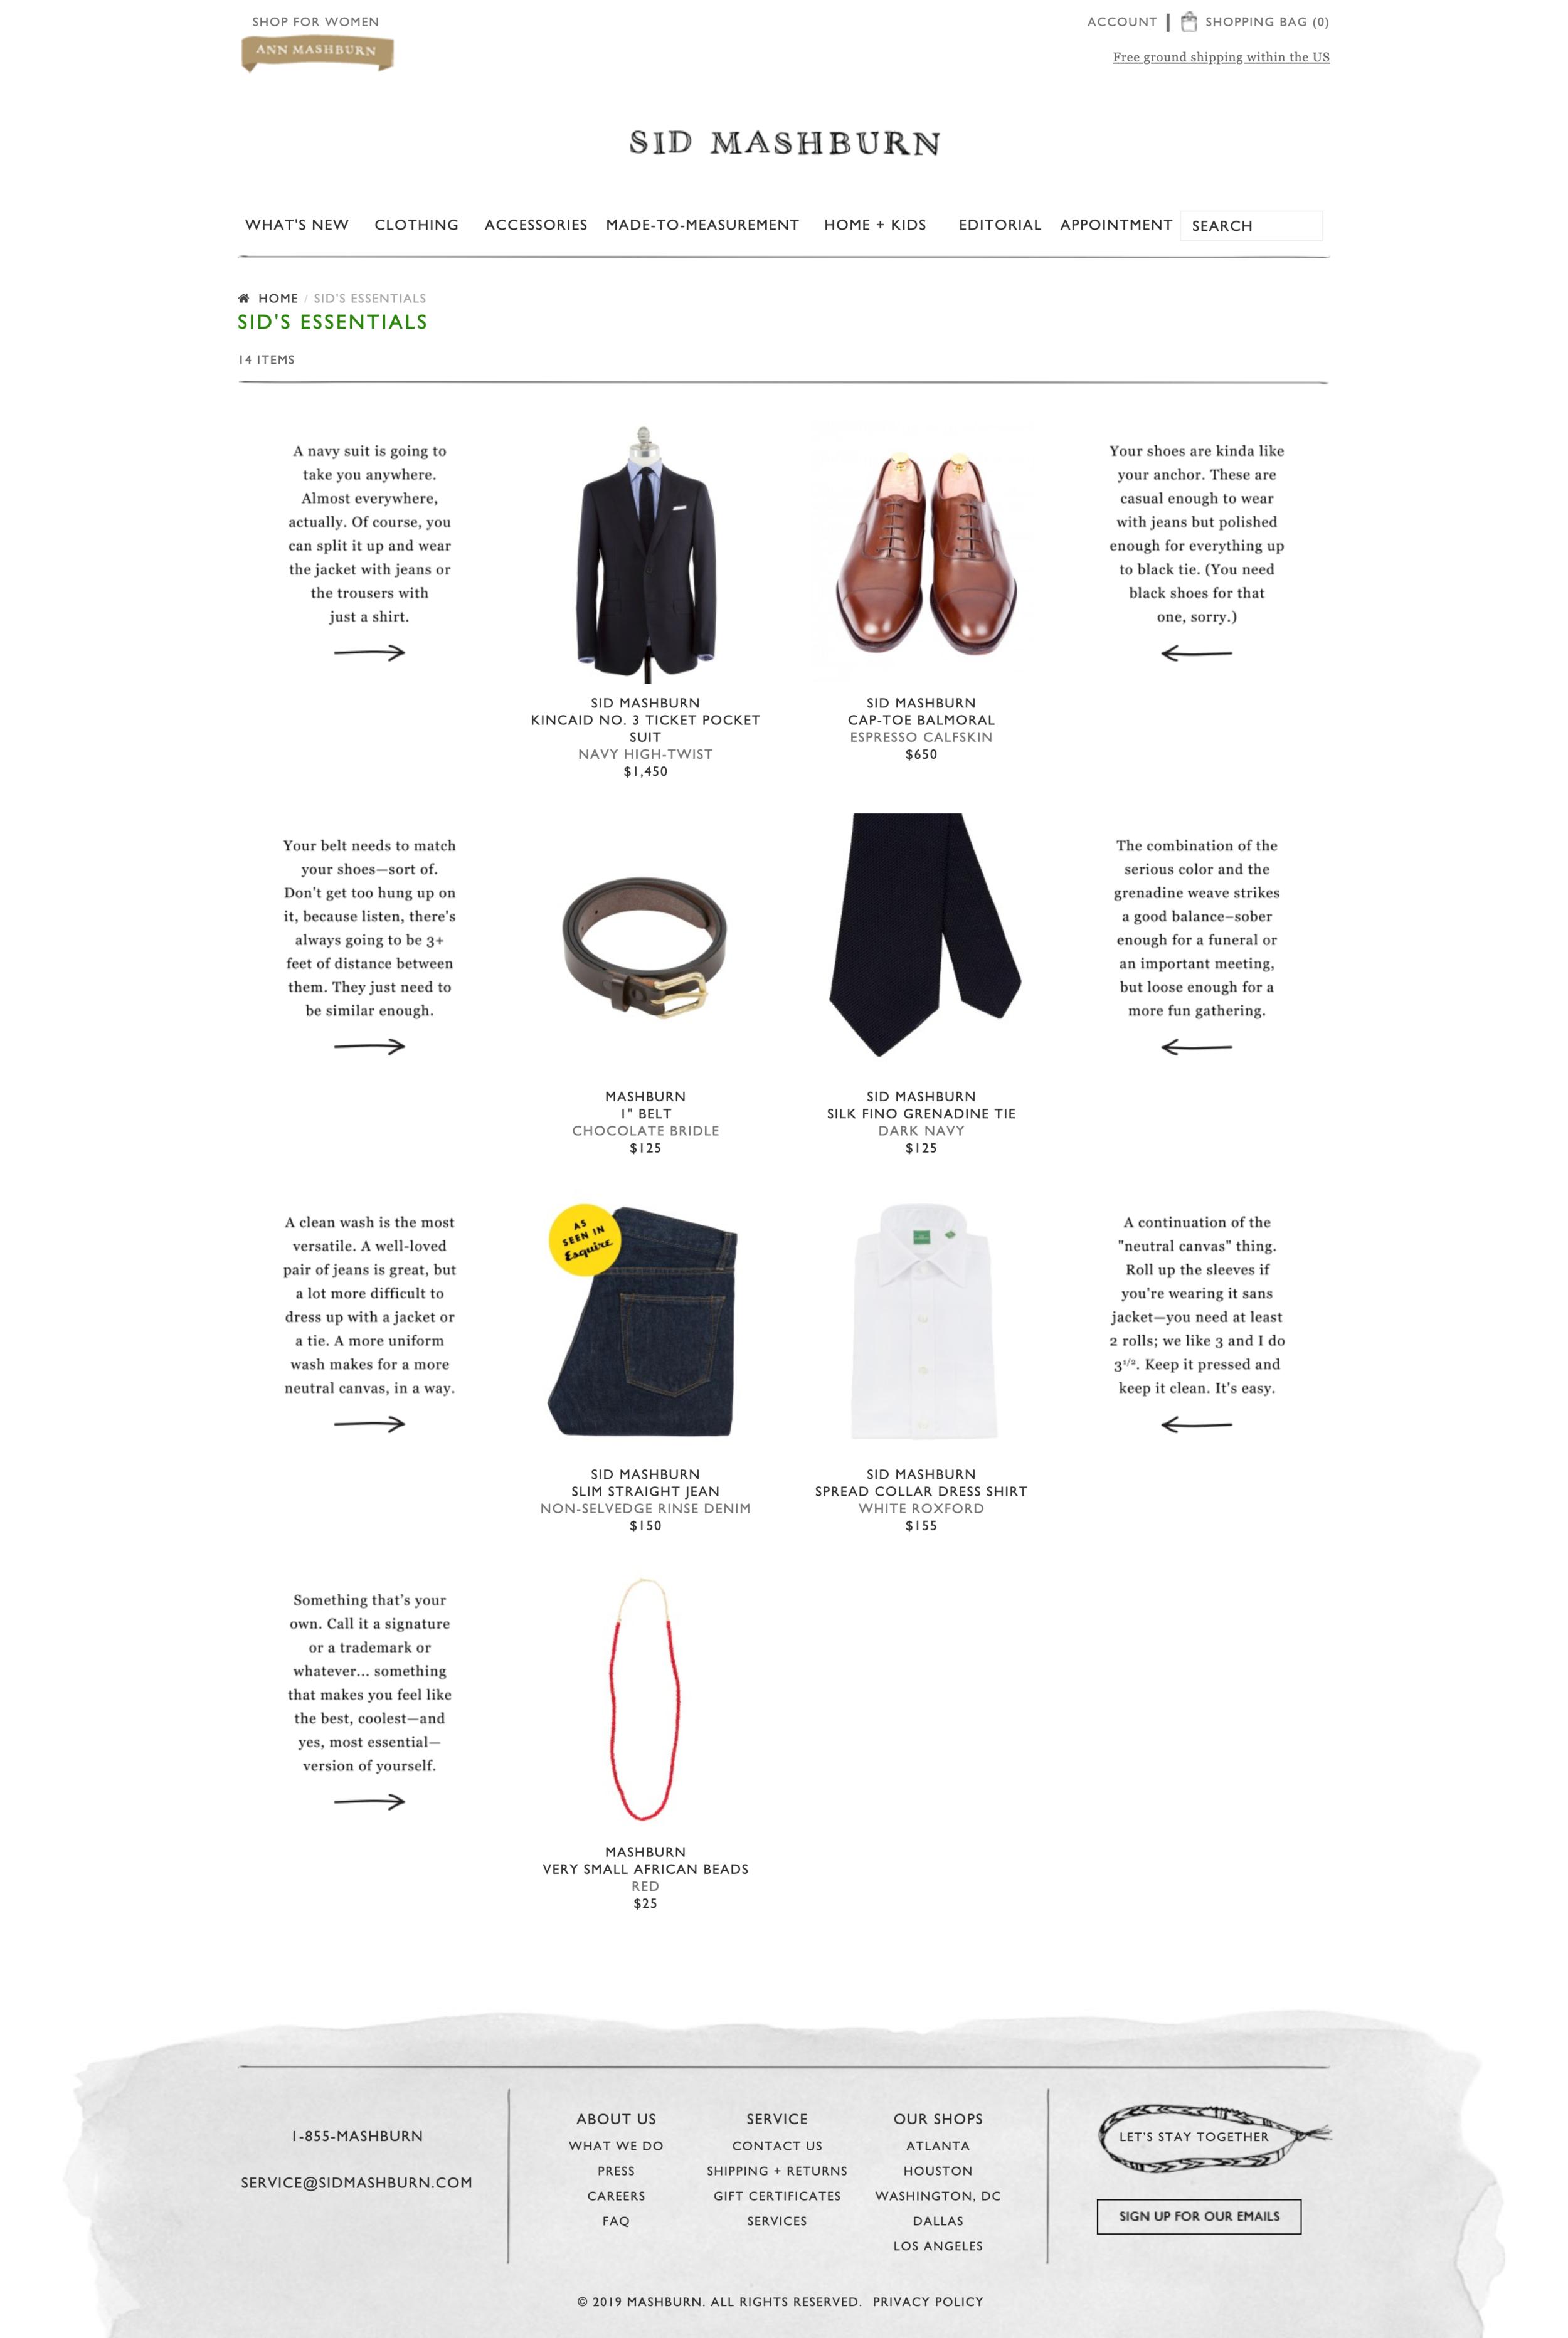 screencapture-sidmashburn-featured-sid-s-essentials-html-2019-09-25-12_16_11.png